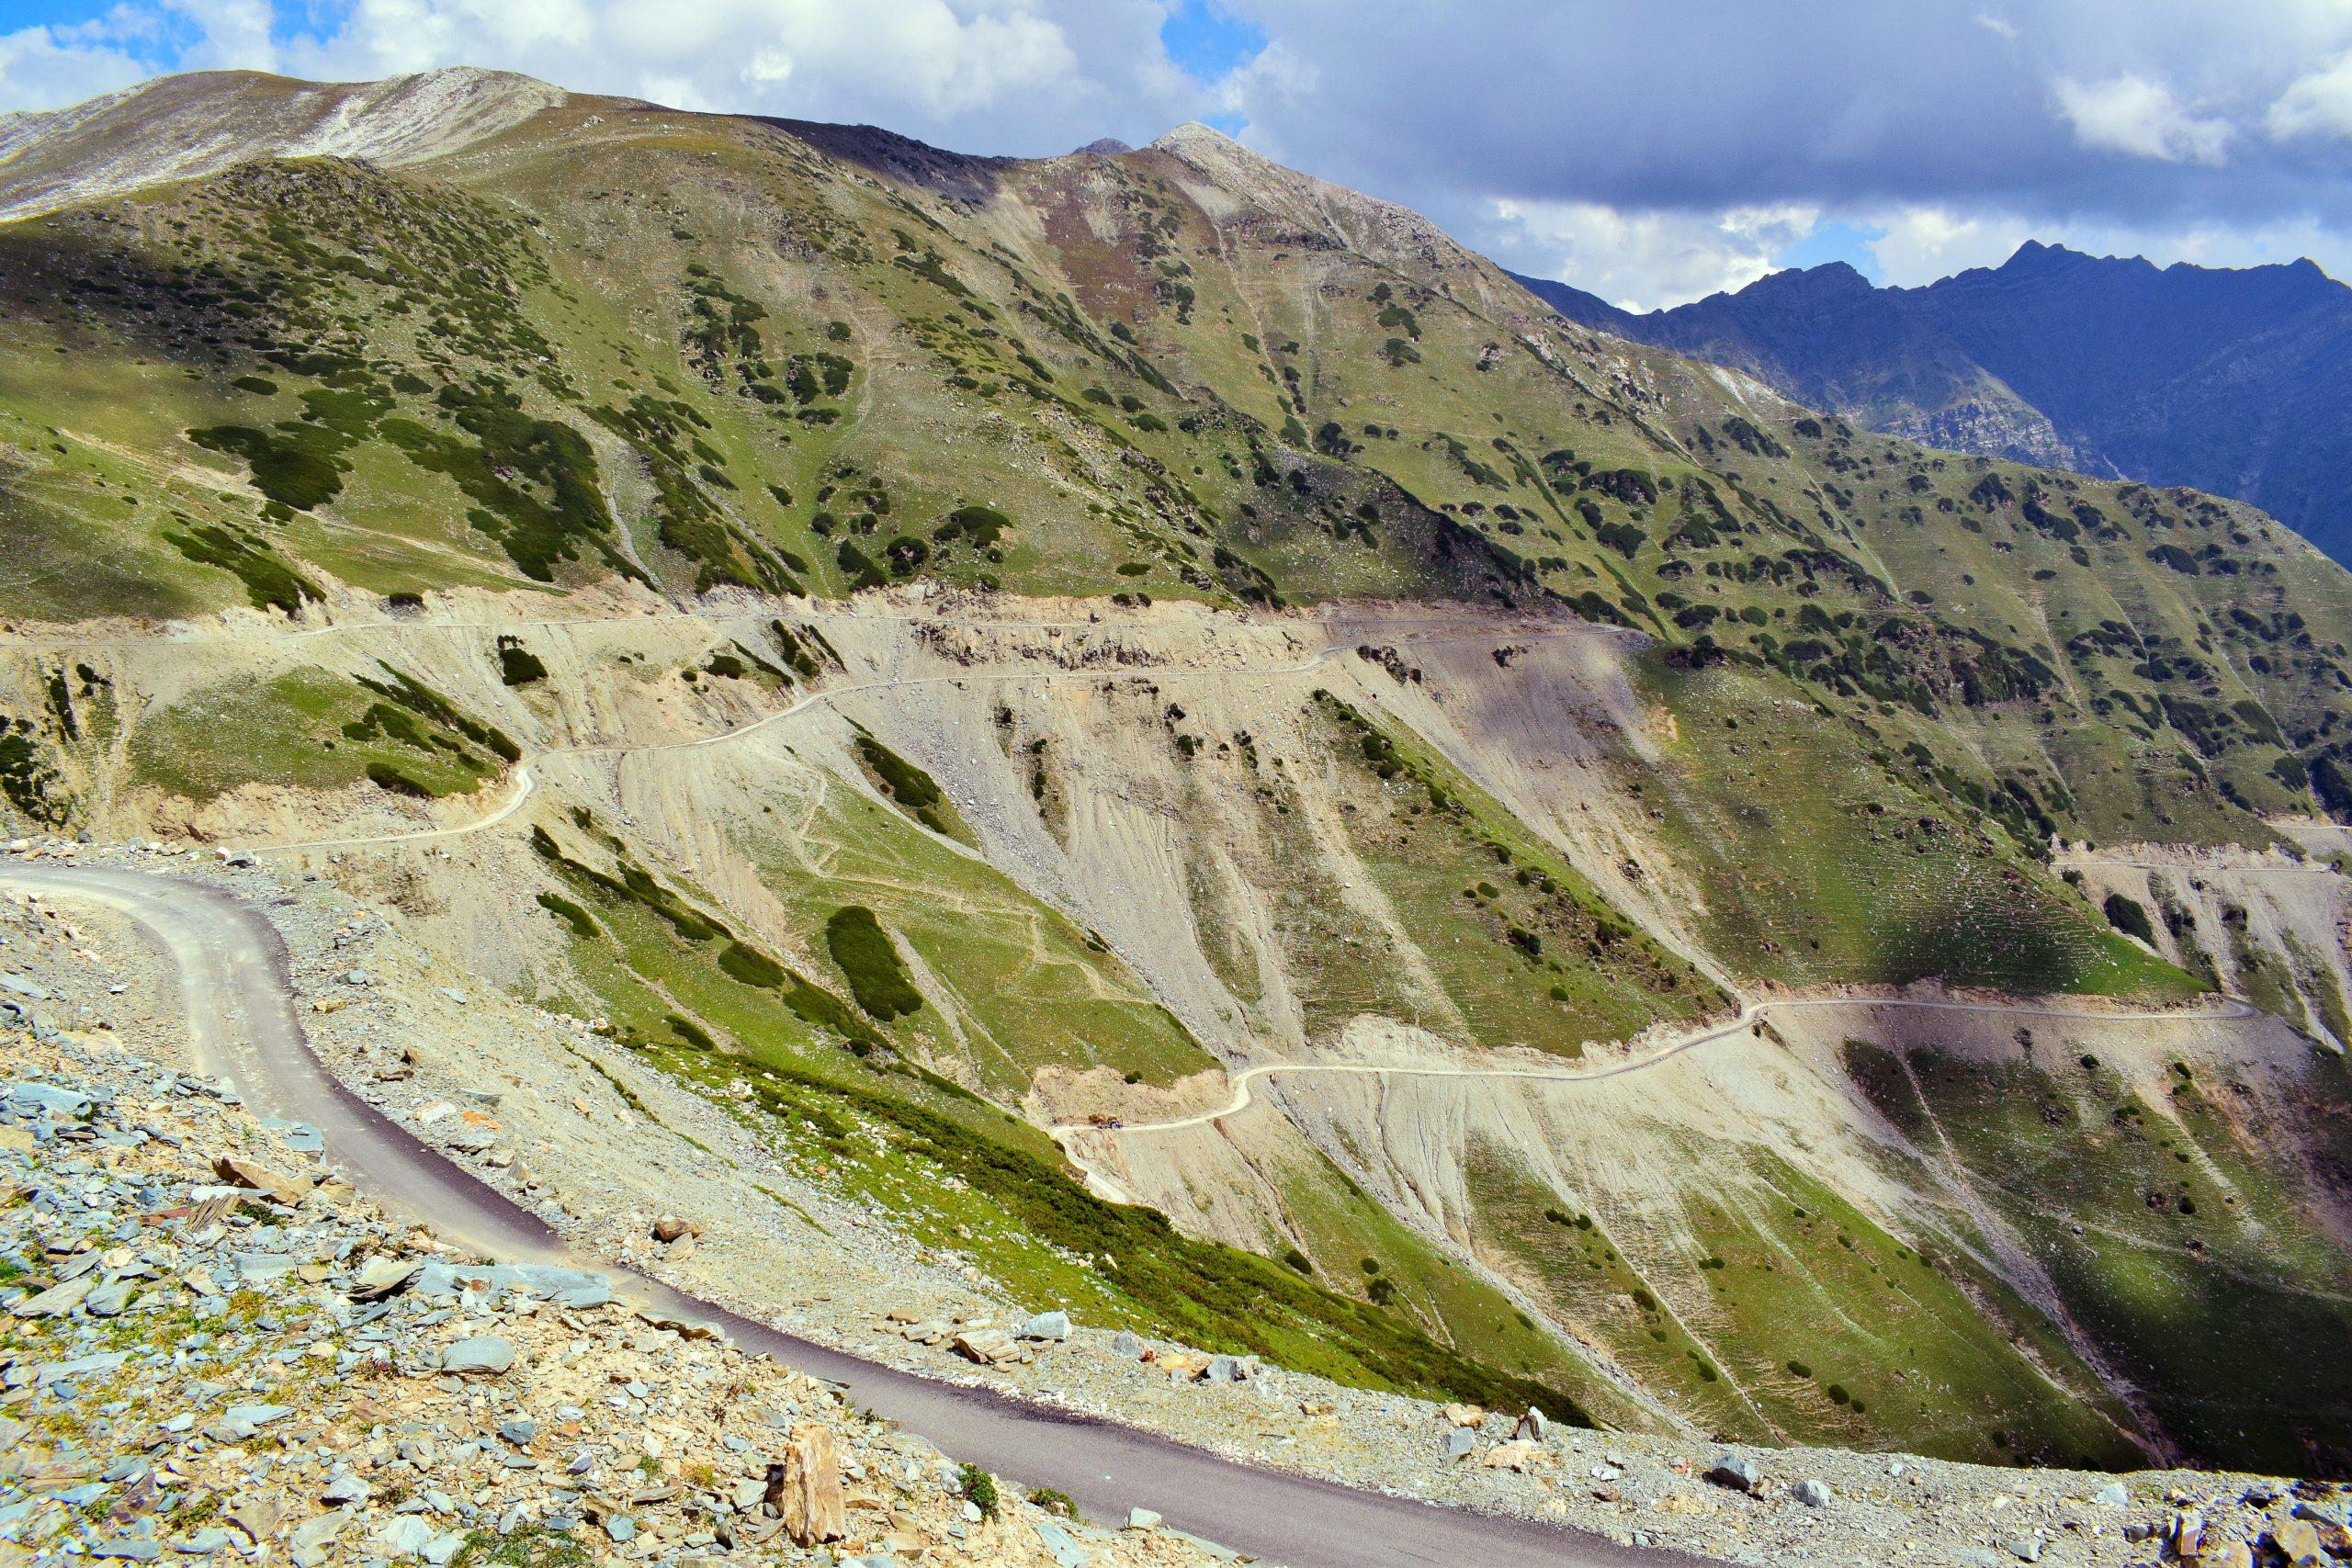 Serene beauty of Sinthan Top in Kashmir.